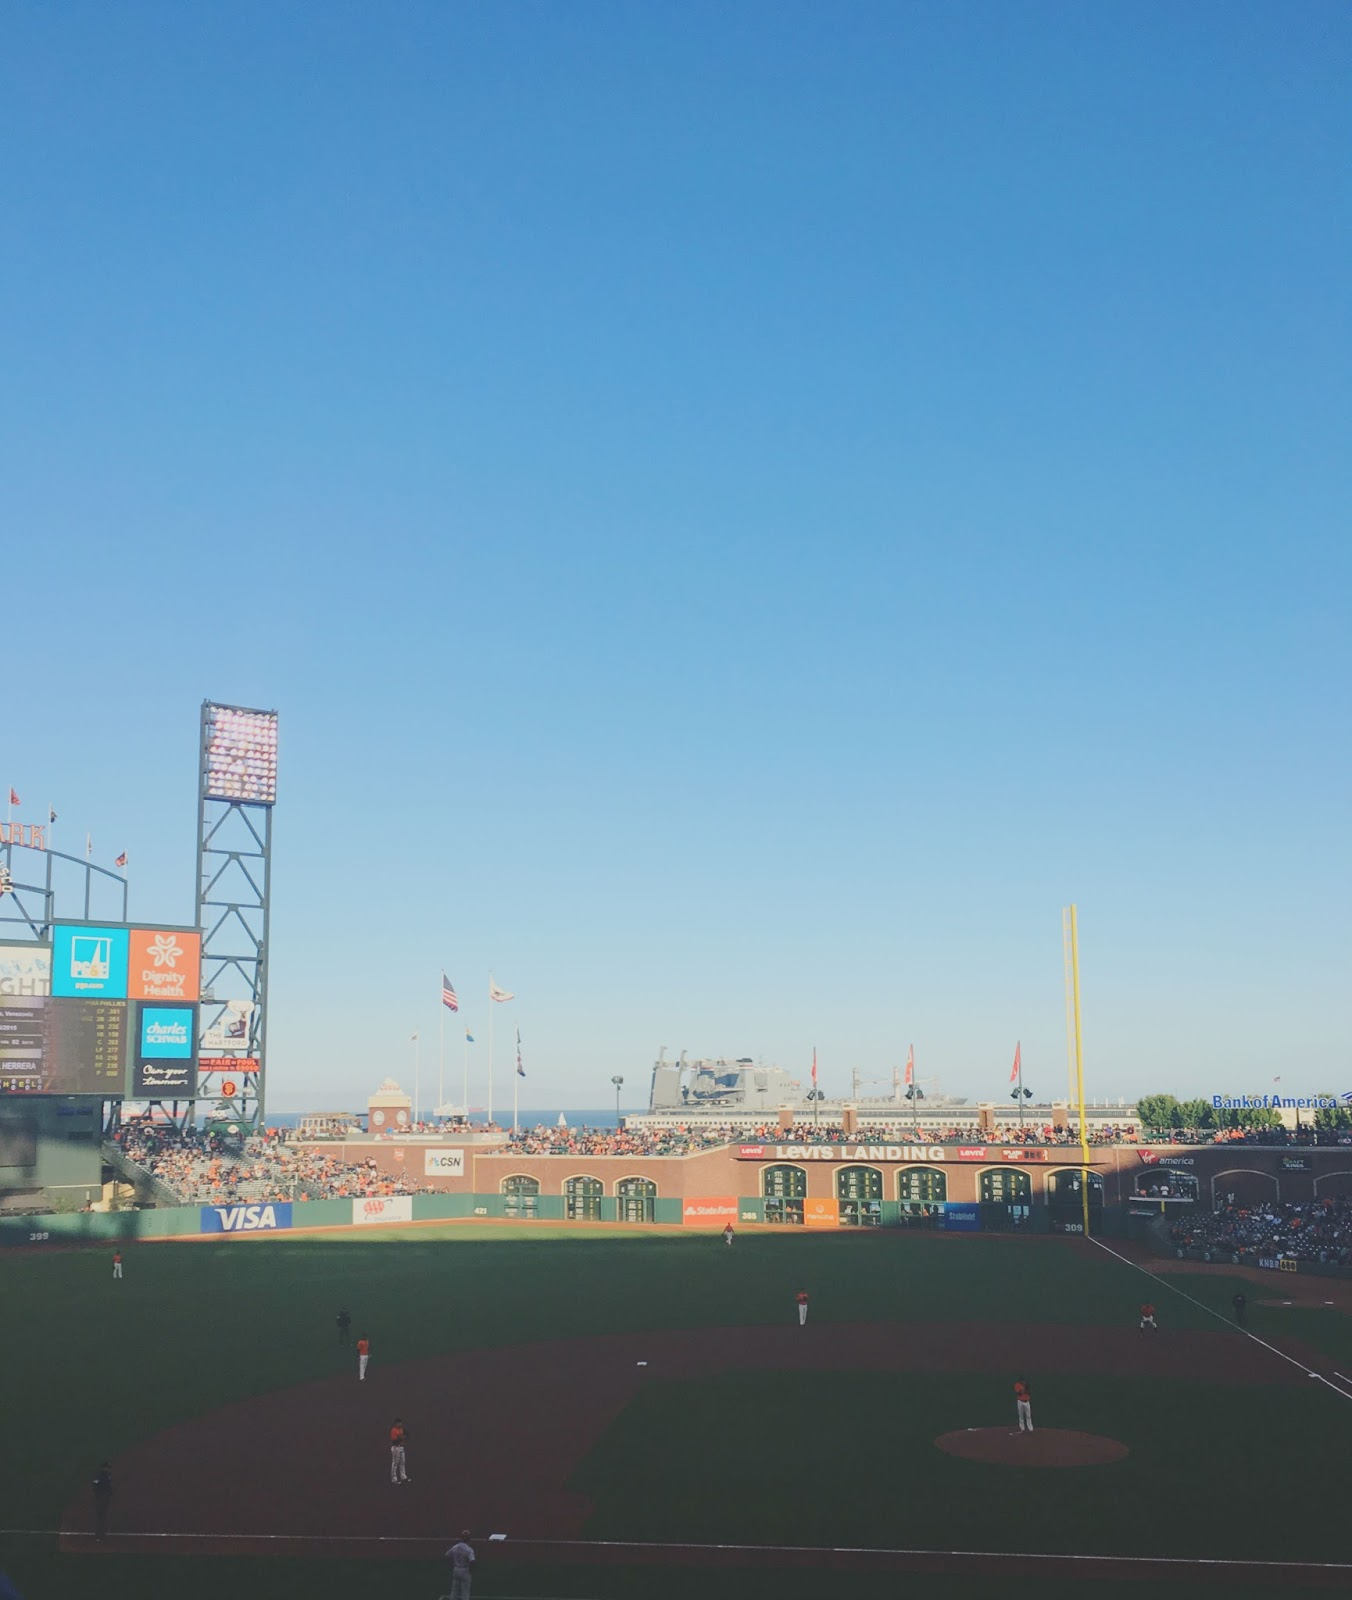 AT&T Park - the baseball stadium in San Francisco, California